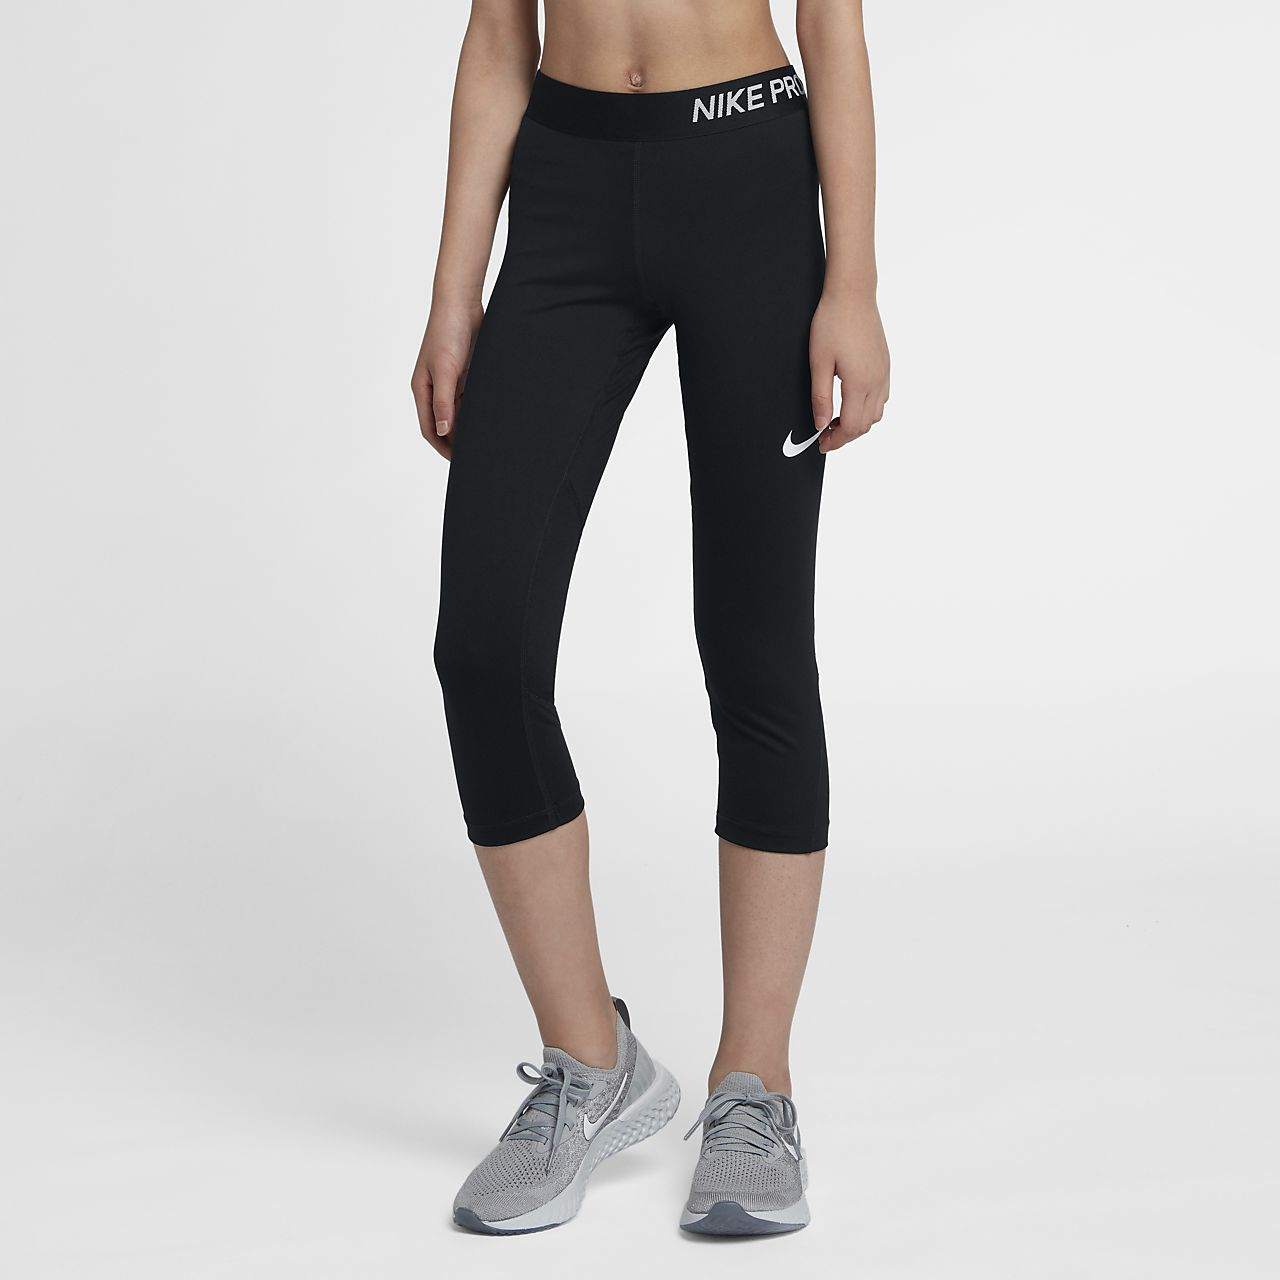 Nike Pro Big Kids  (Girls ) Training Capris. Nike.com f49560b70